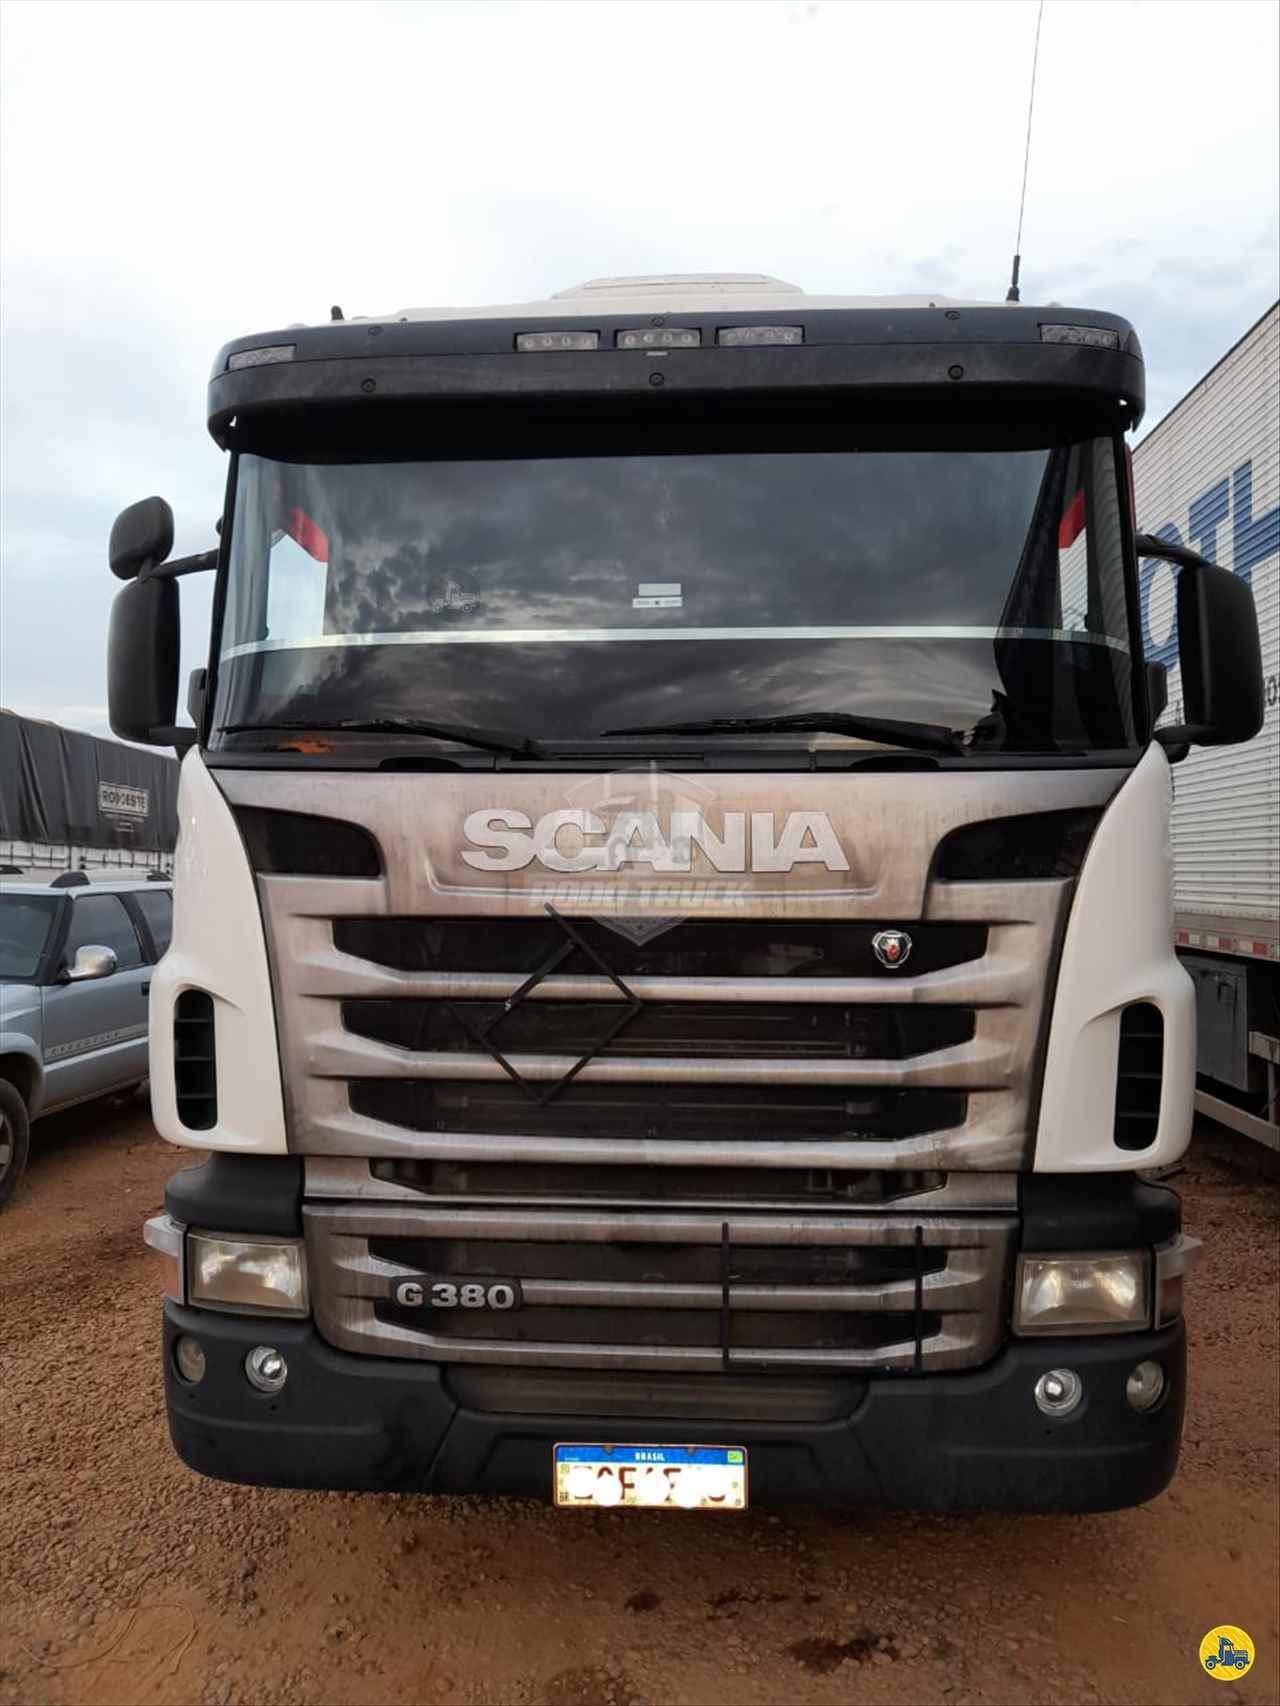 SCANIA 380 de Rodotruck Caminhões - RONDONOPOLIS/MT